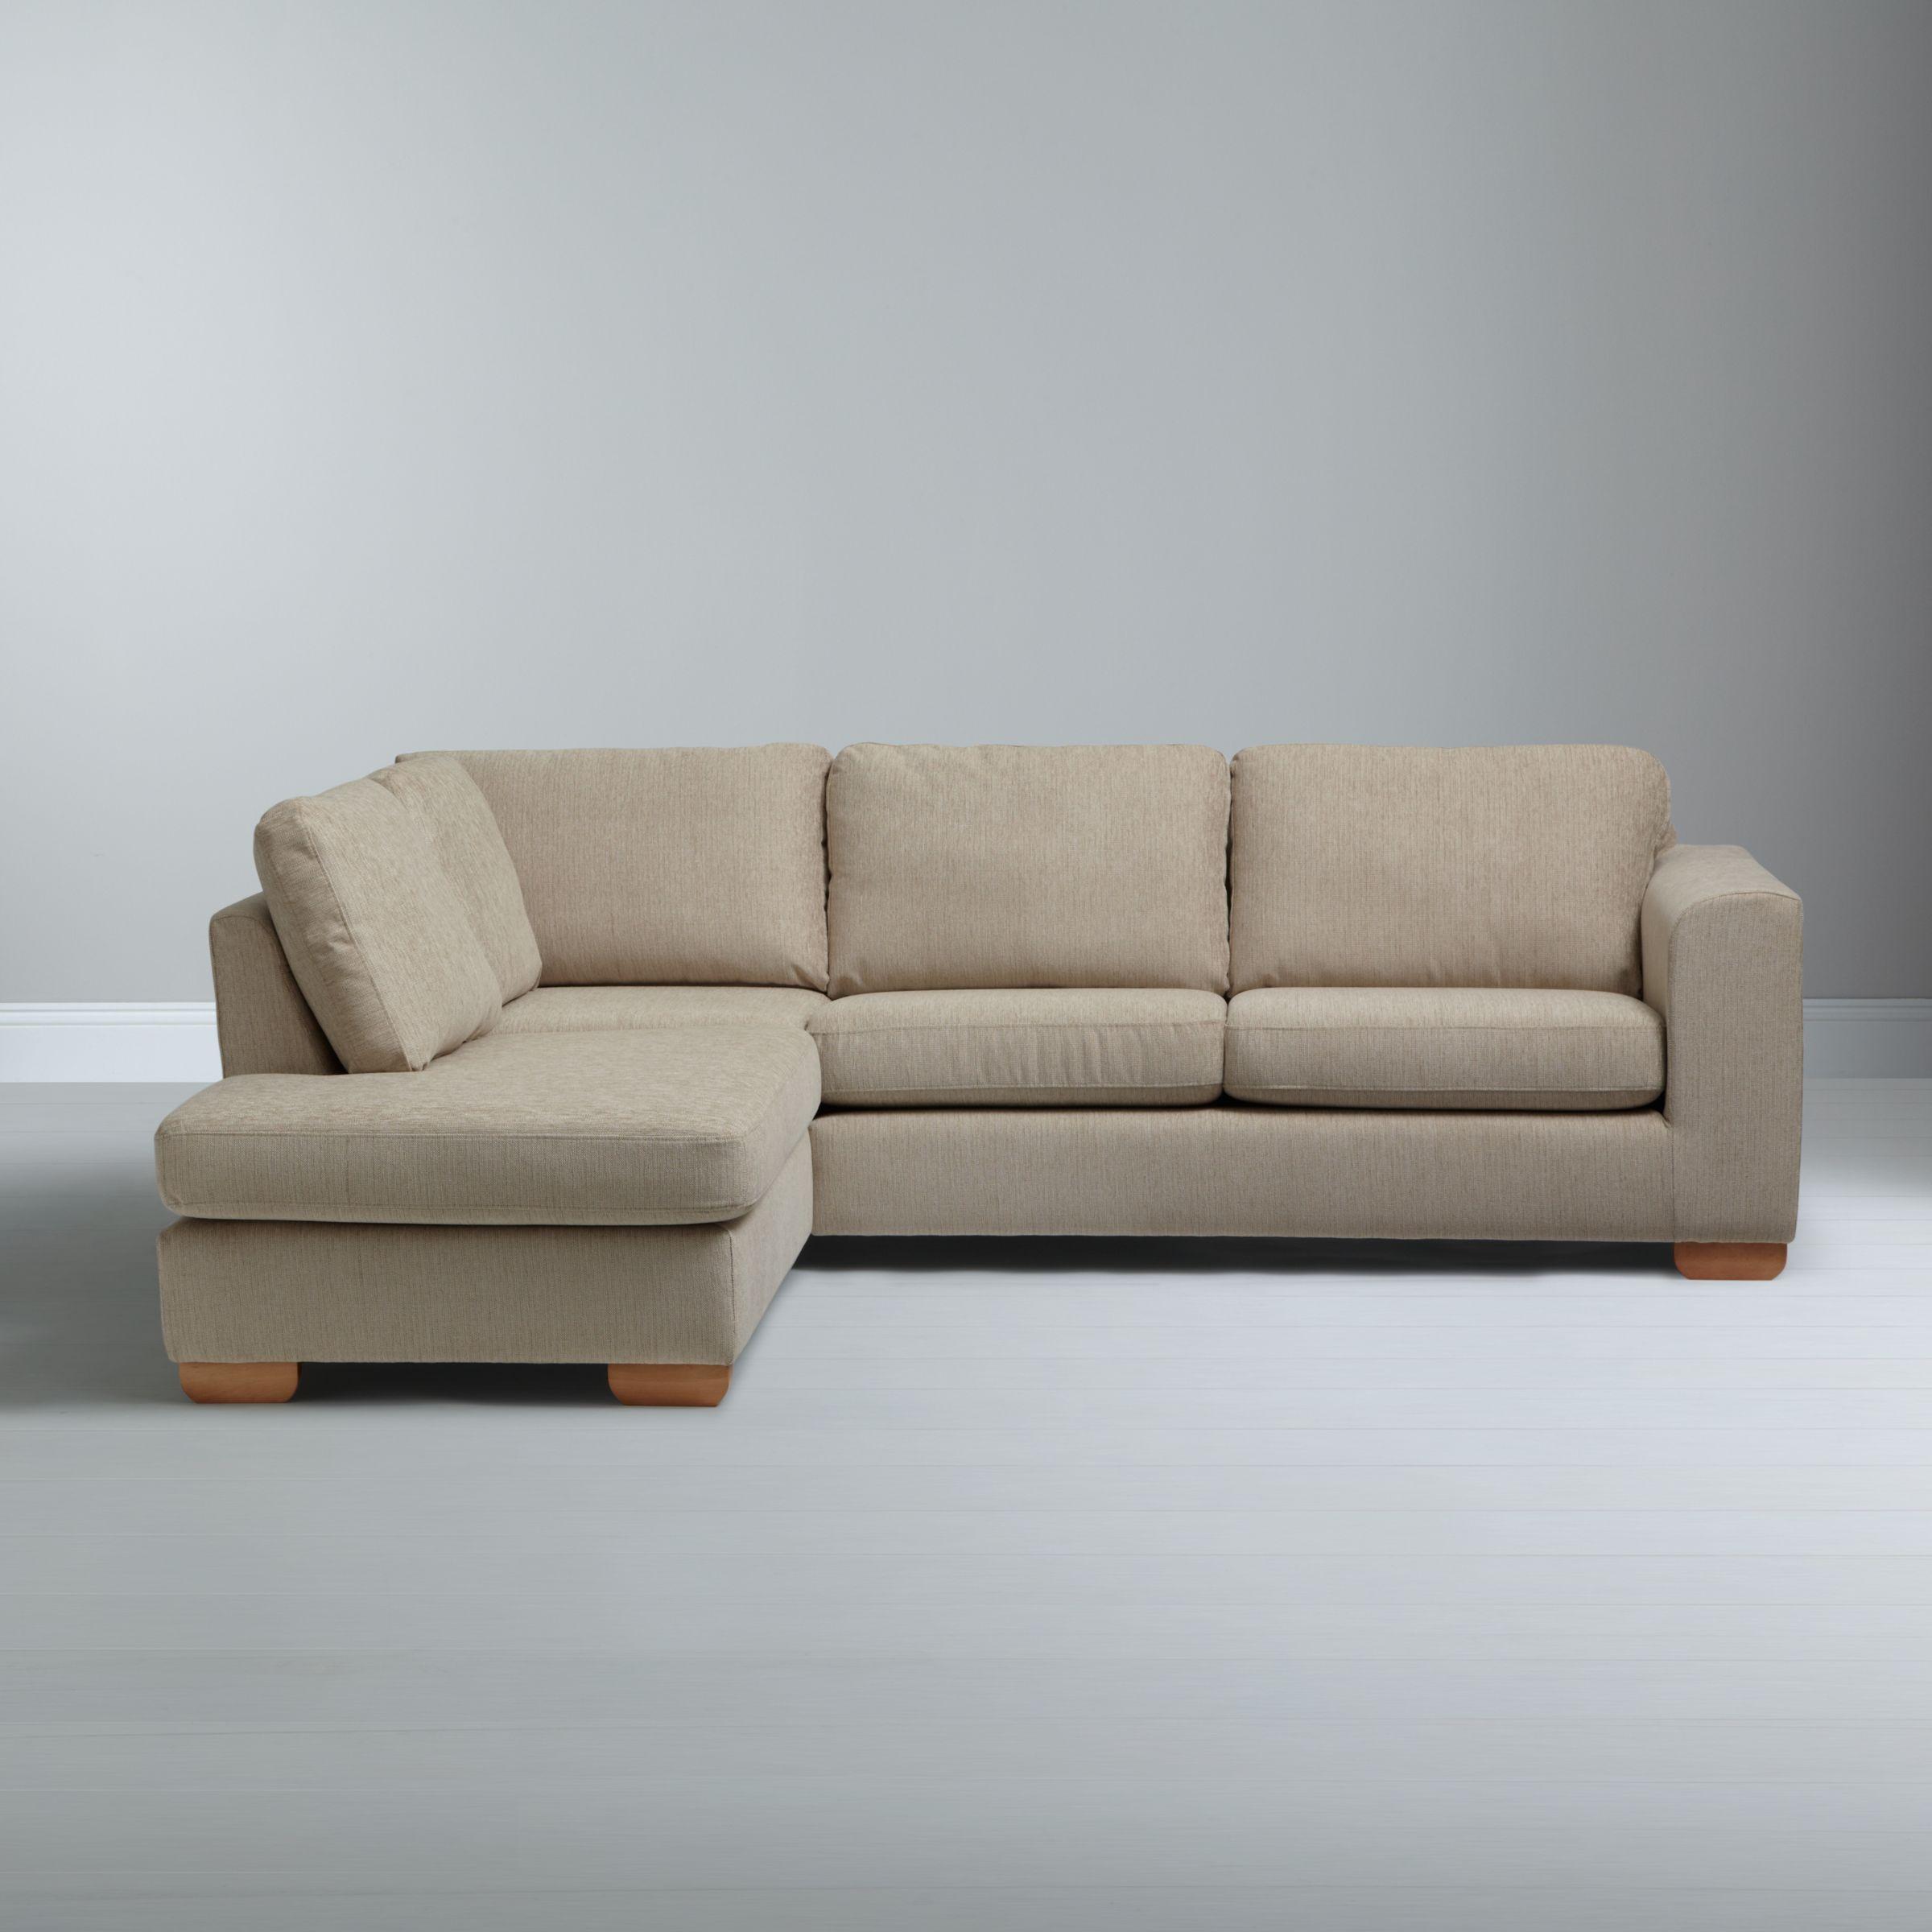 Dress womens clothing: Chaise corner sofa